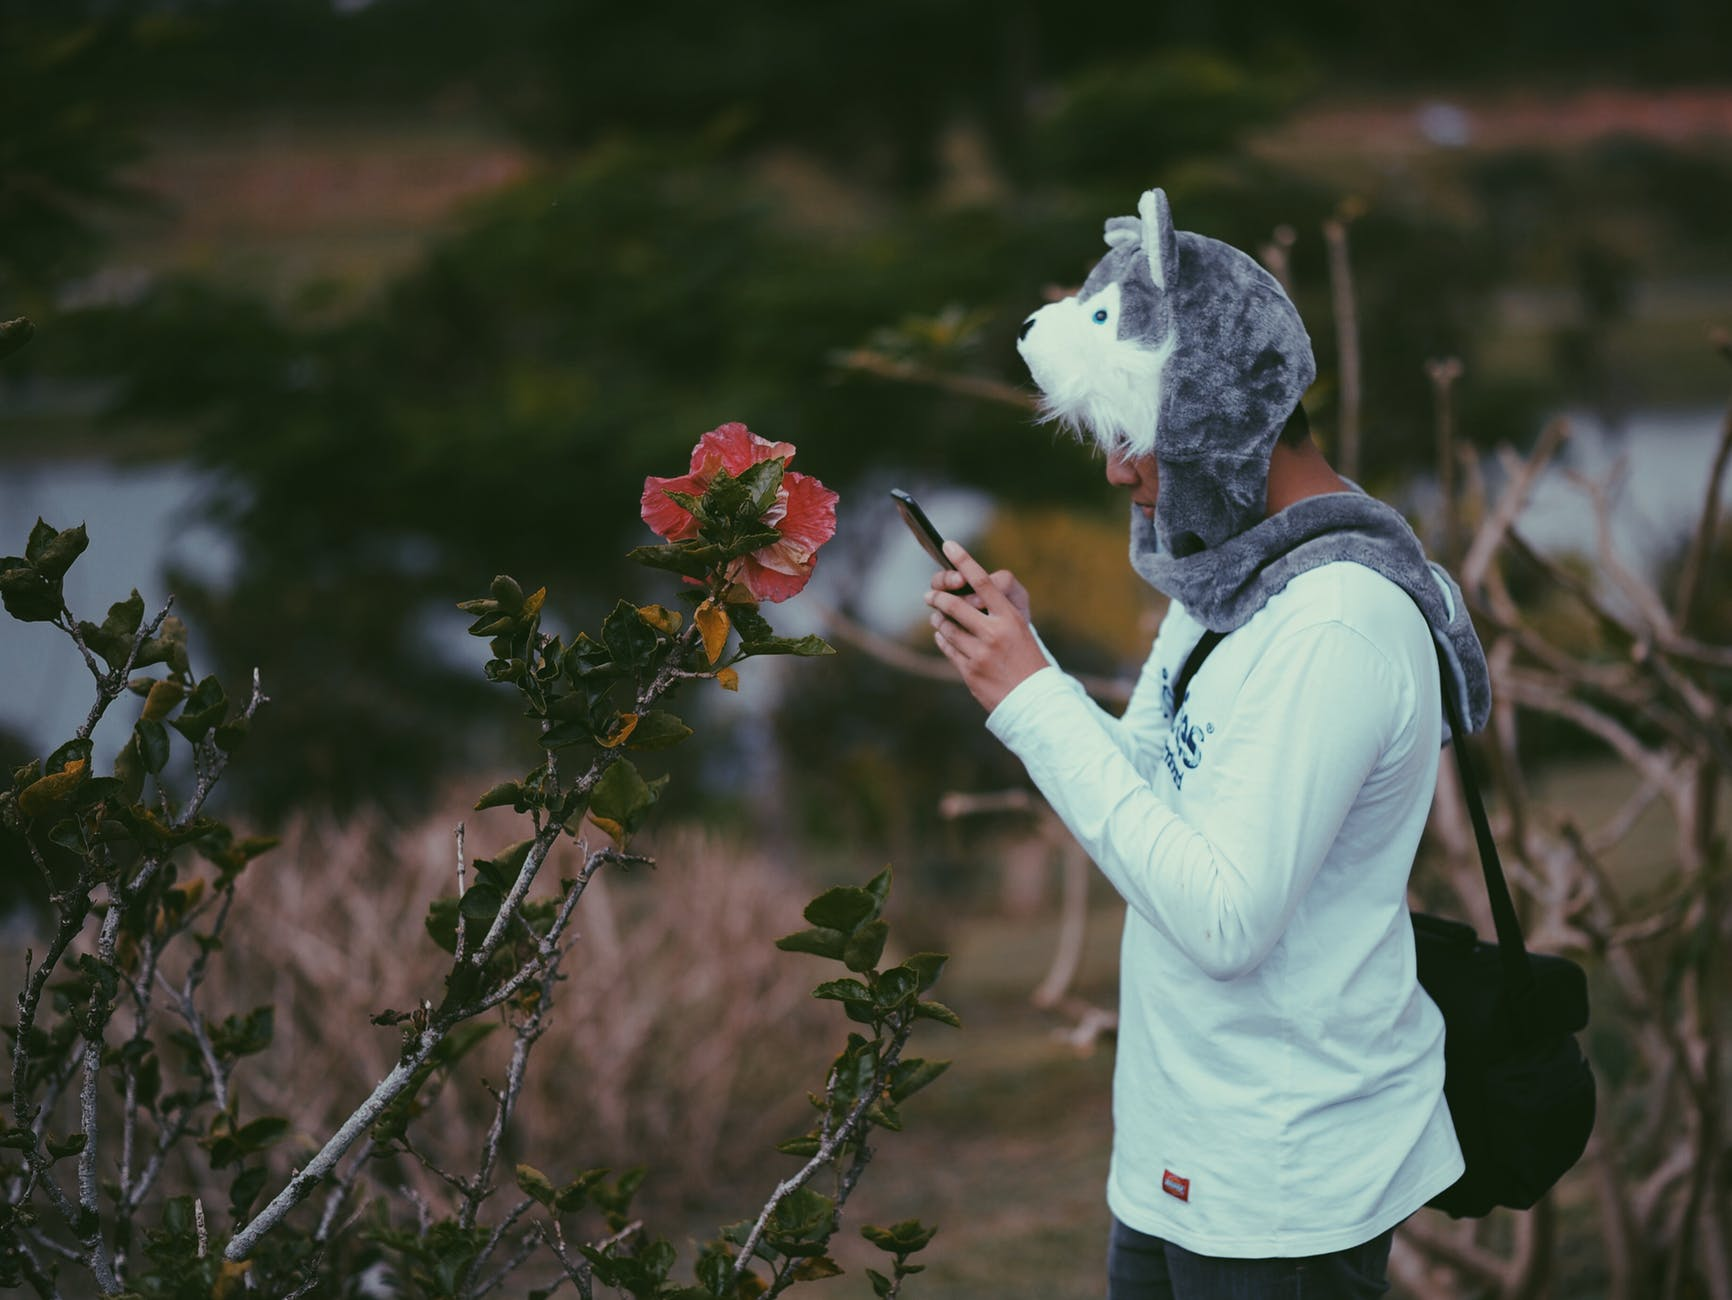 Man Wearing Grey Wolf Critter Cap Taking a Photo of Pink Hibiscus Flower, Man Wearing Grey Wolf Critter Cap Taking a Photo of Pink Hibiscus Flower